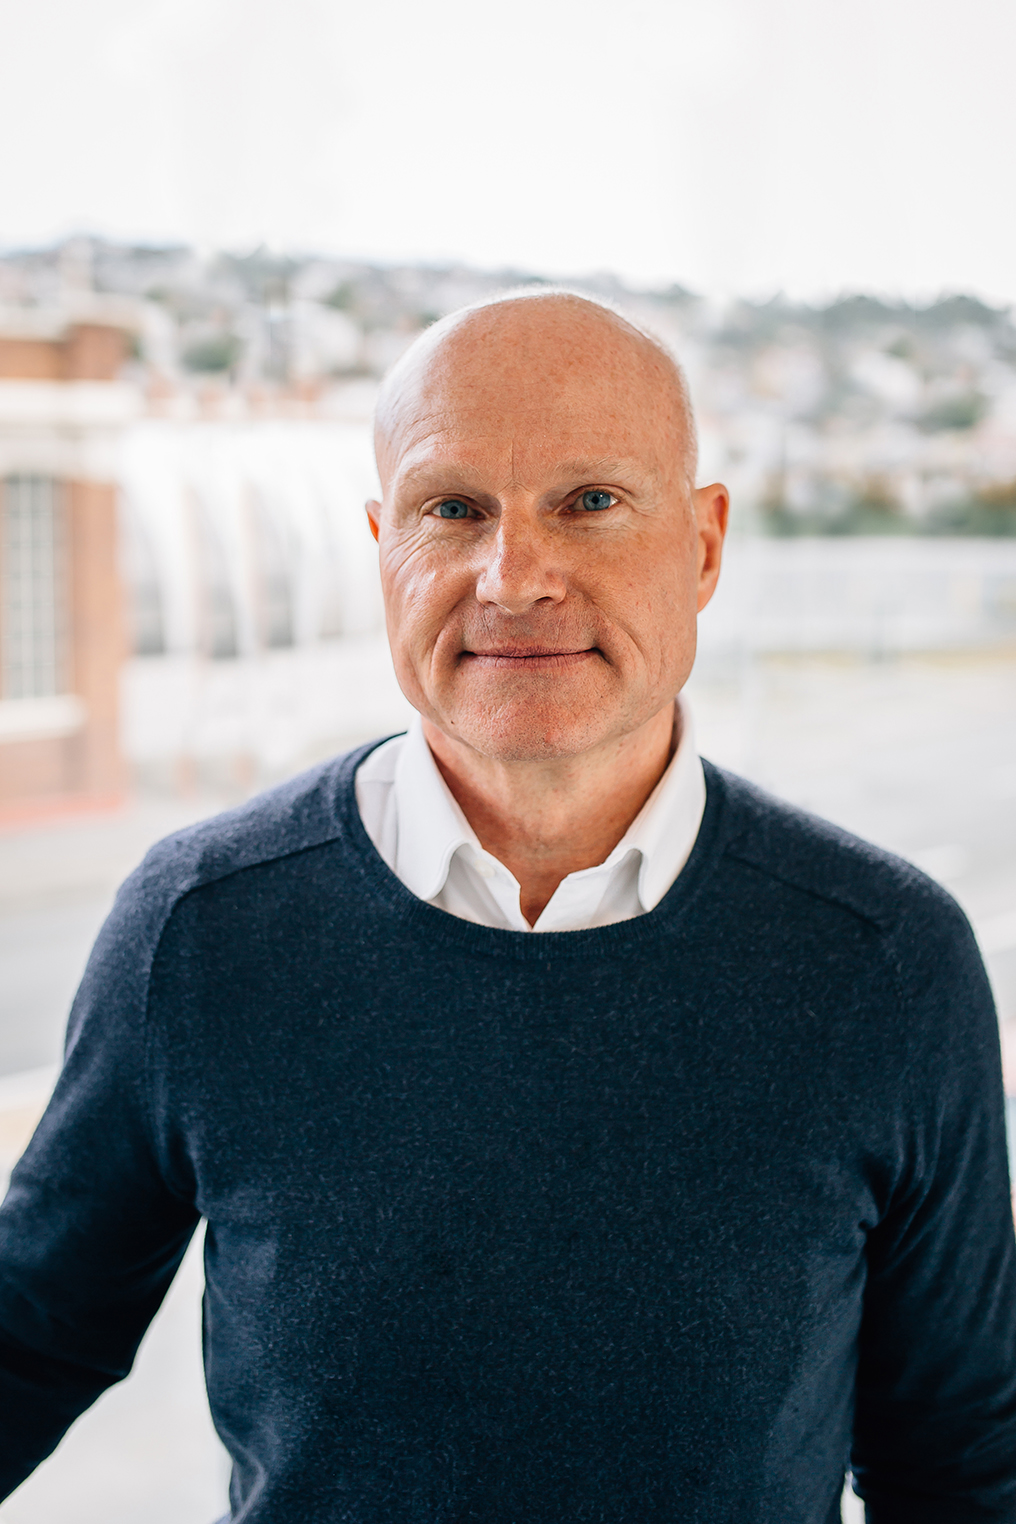 Simon Froude - Registered Psychotherapist